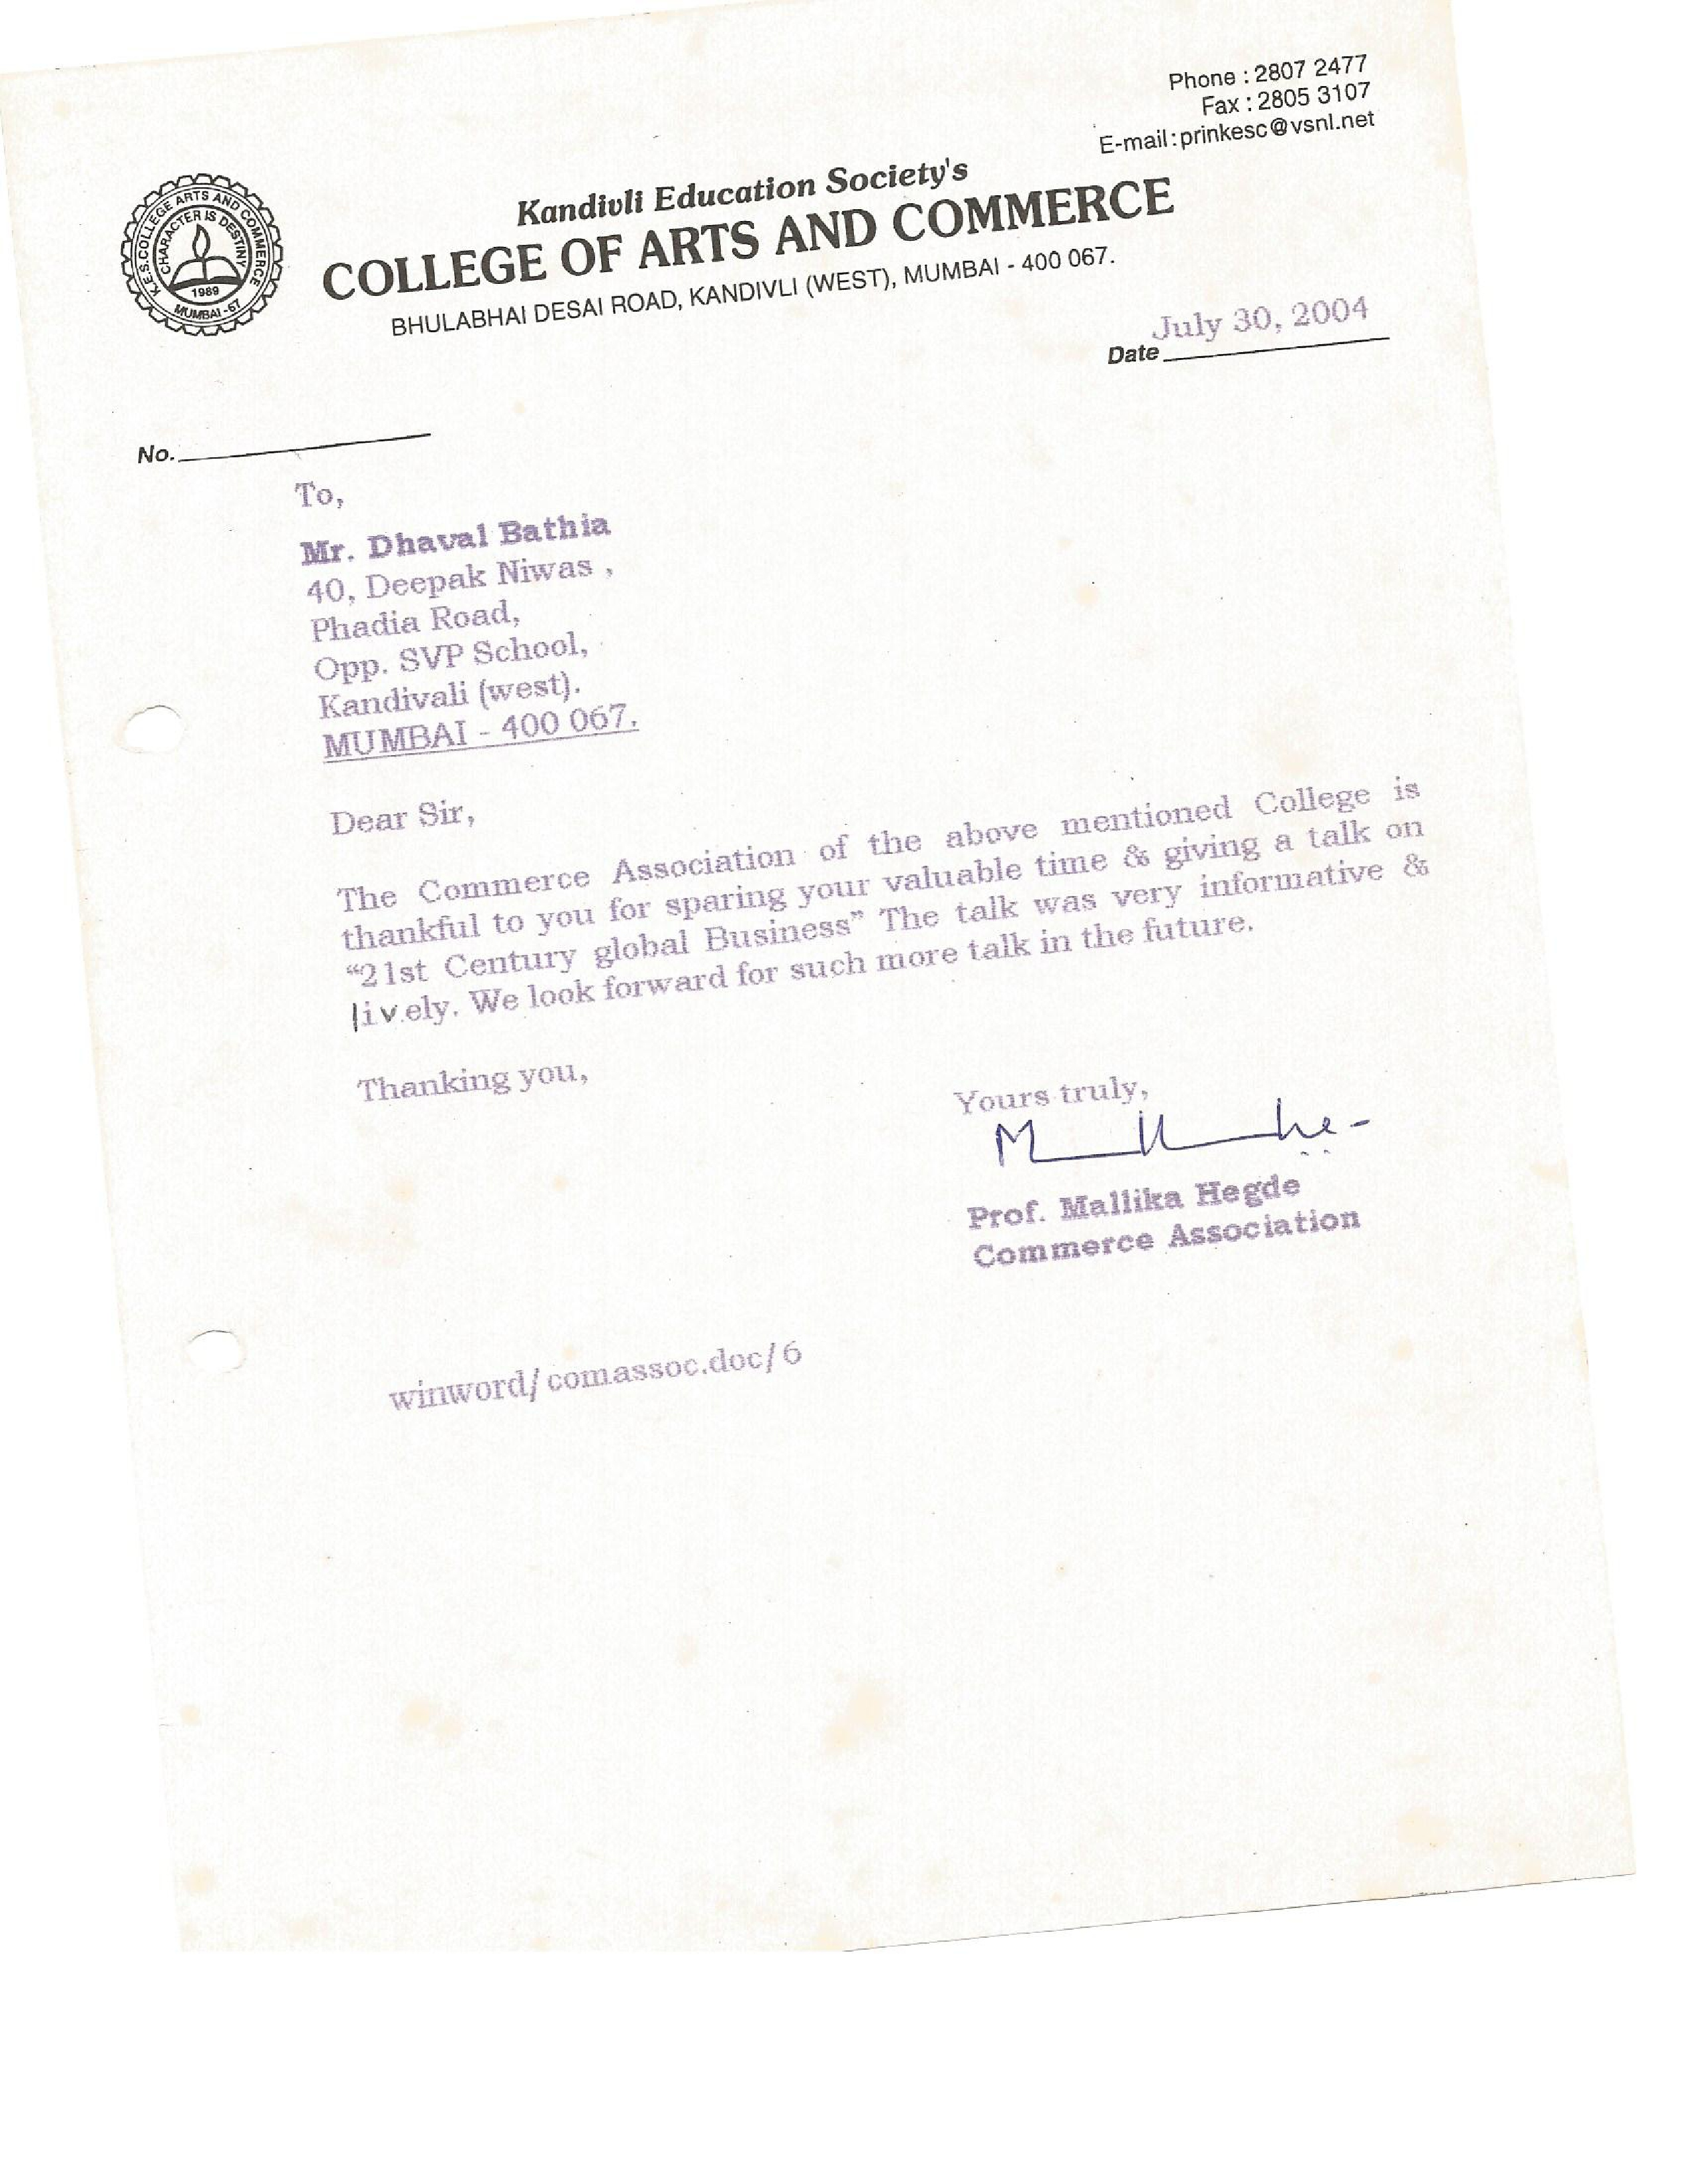 KES College Mumbai